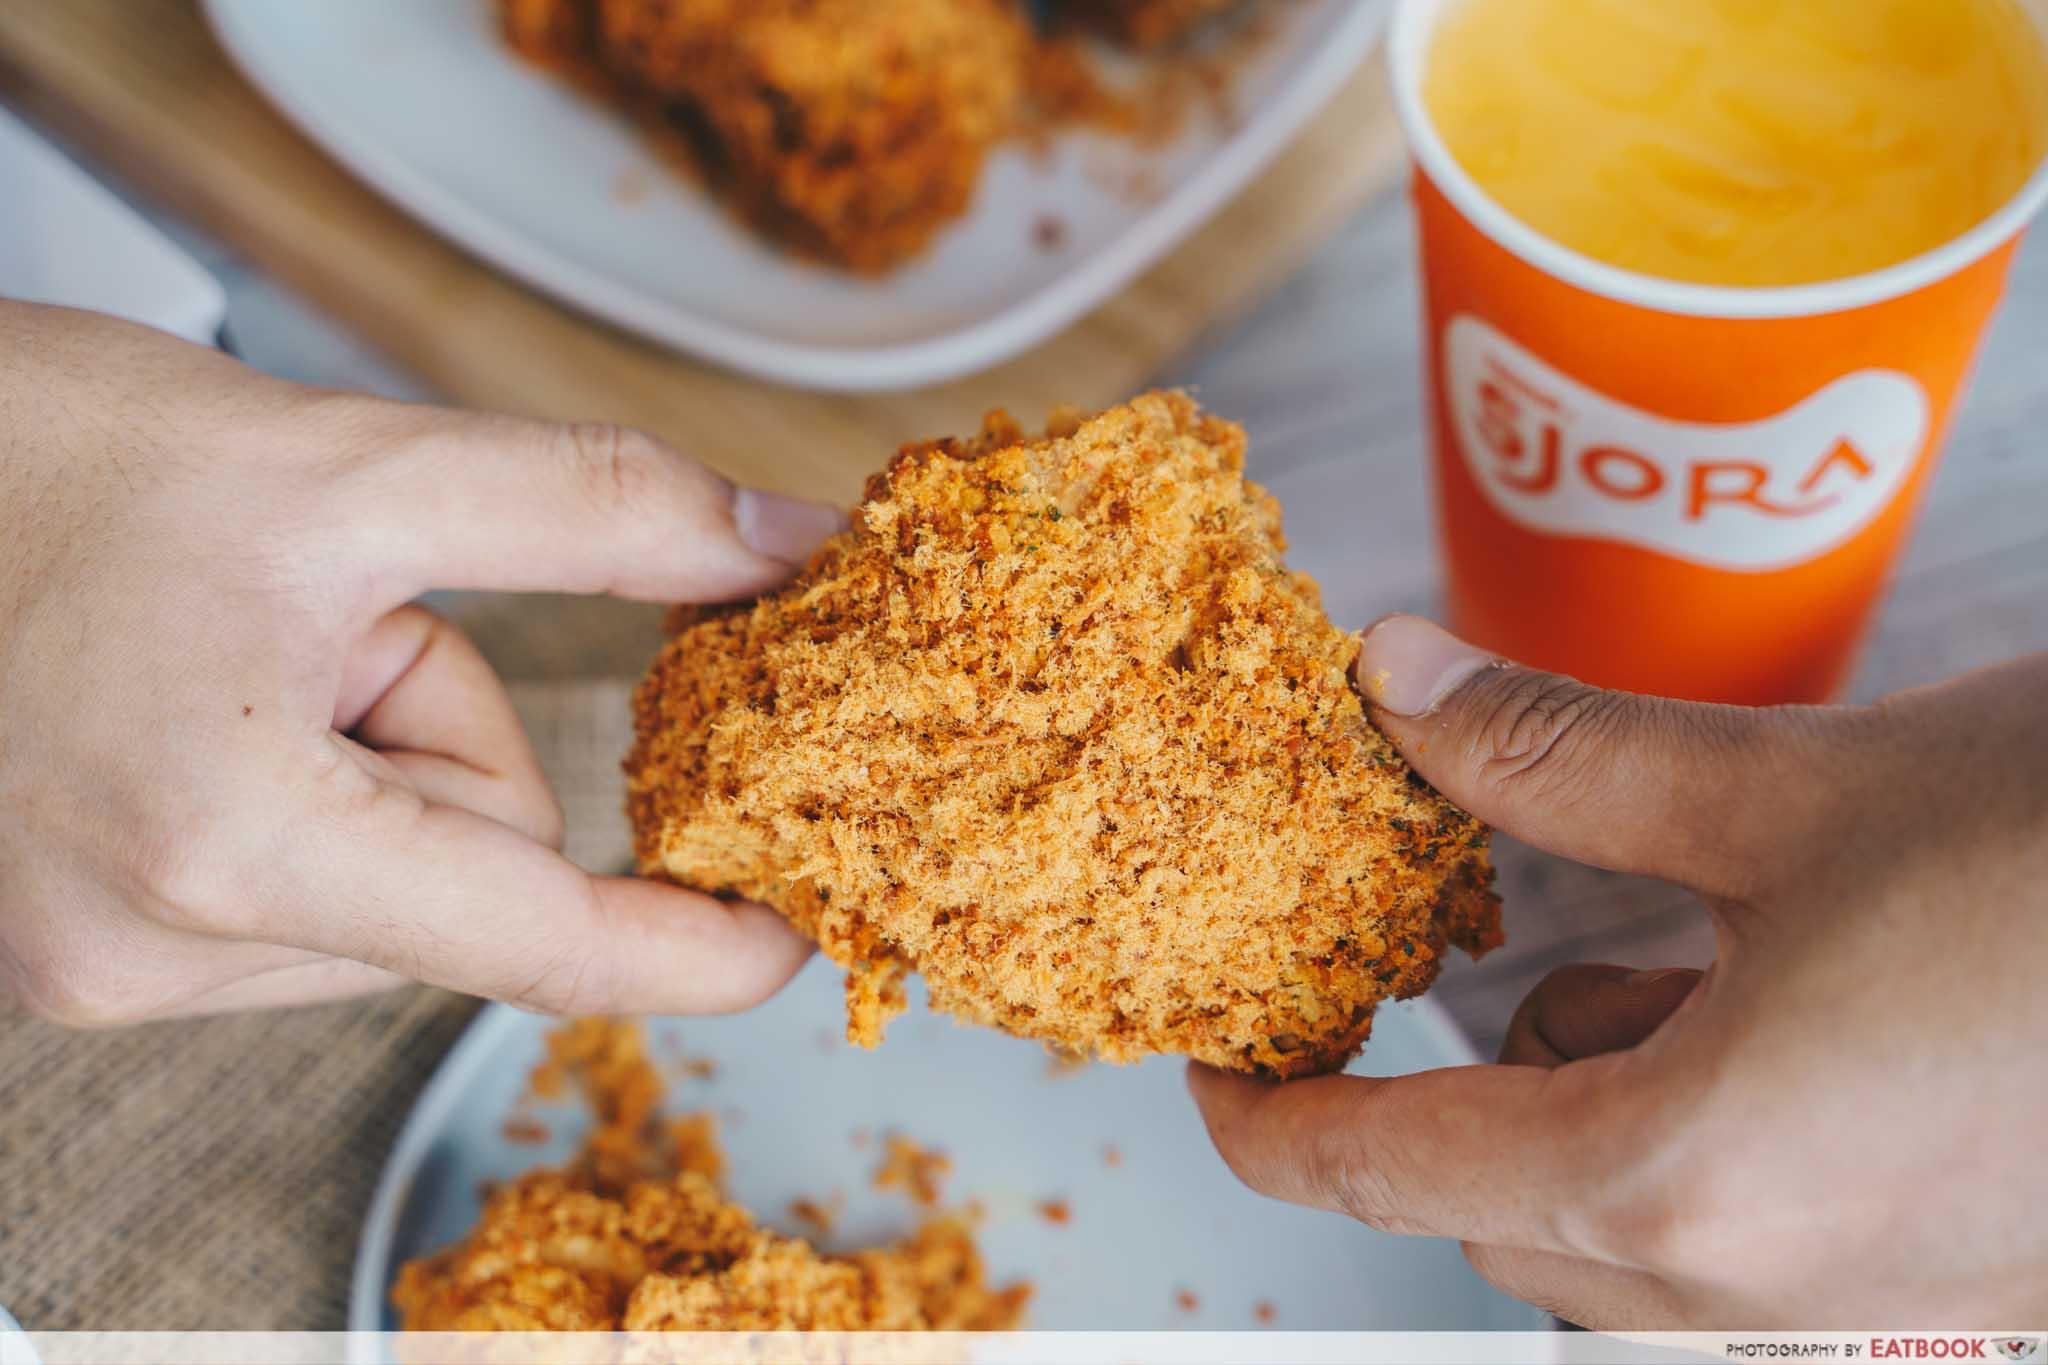 KFC Flossy Crunch Chicken - chicken floss topping